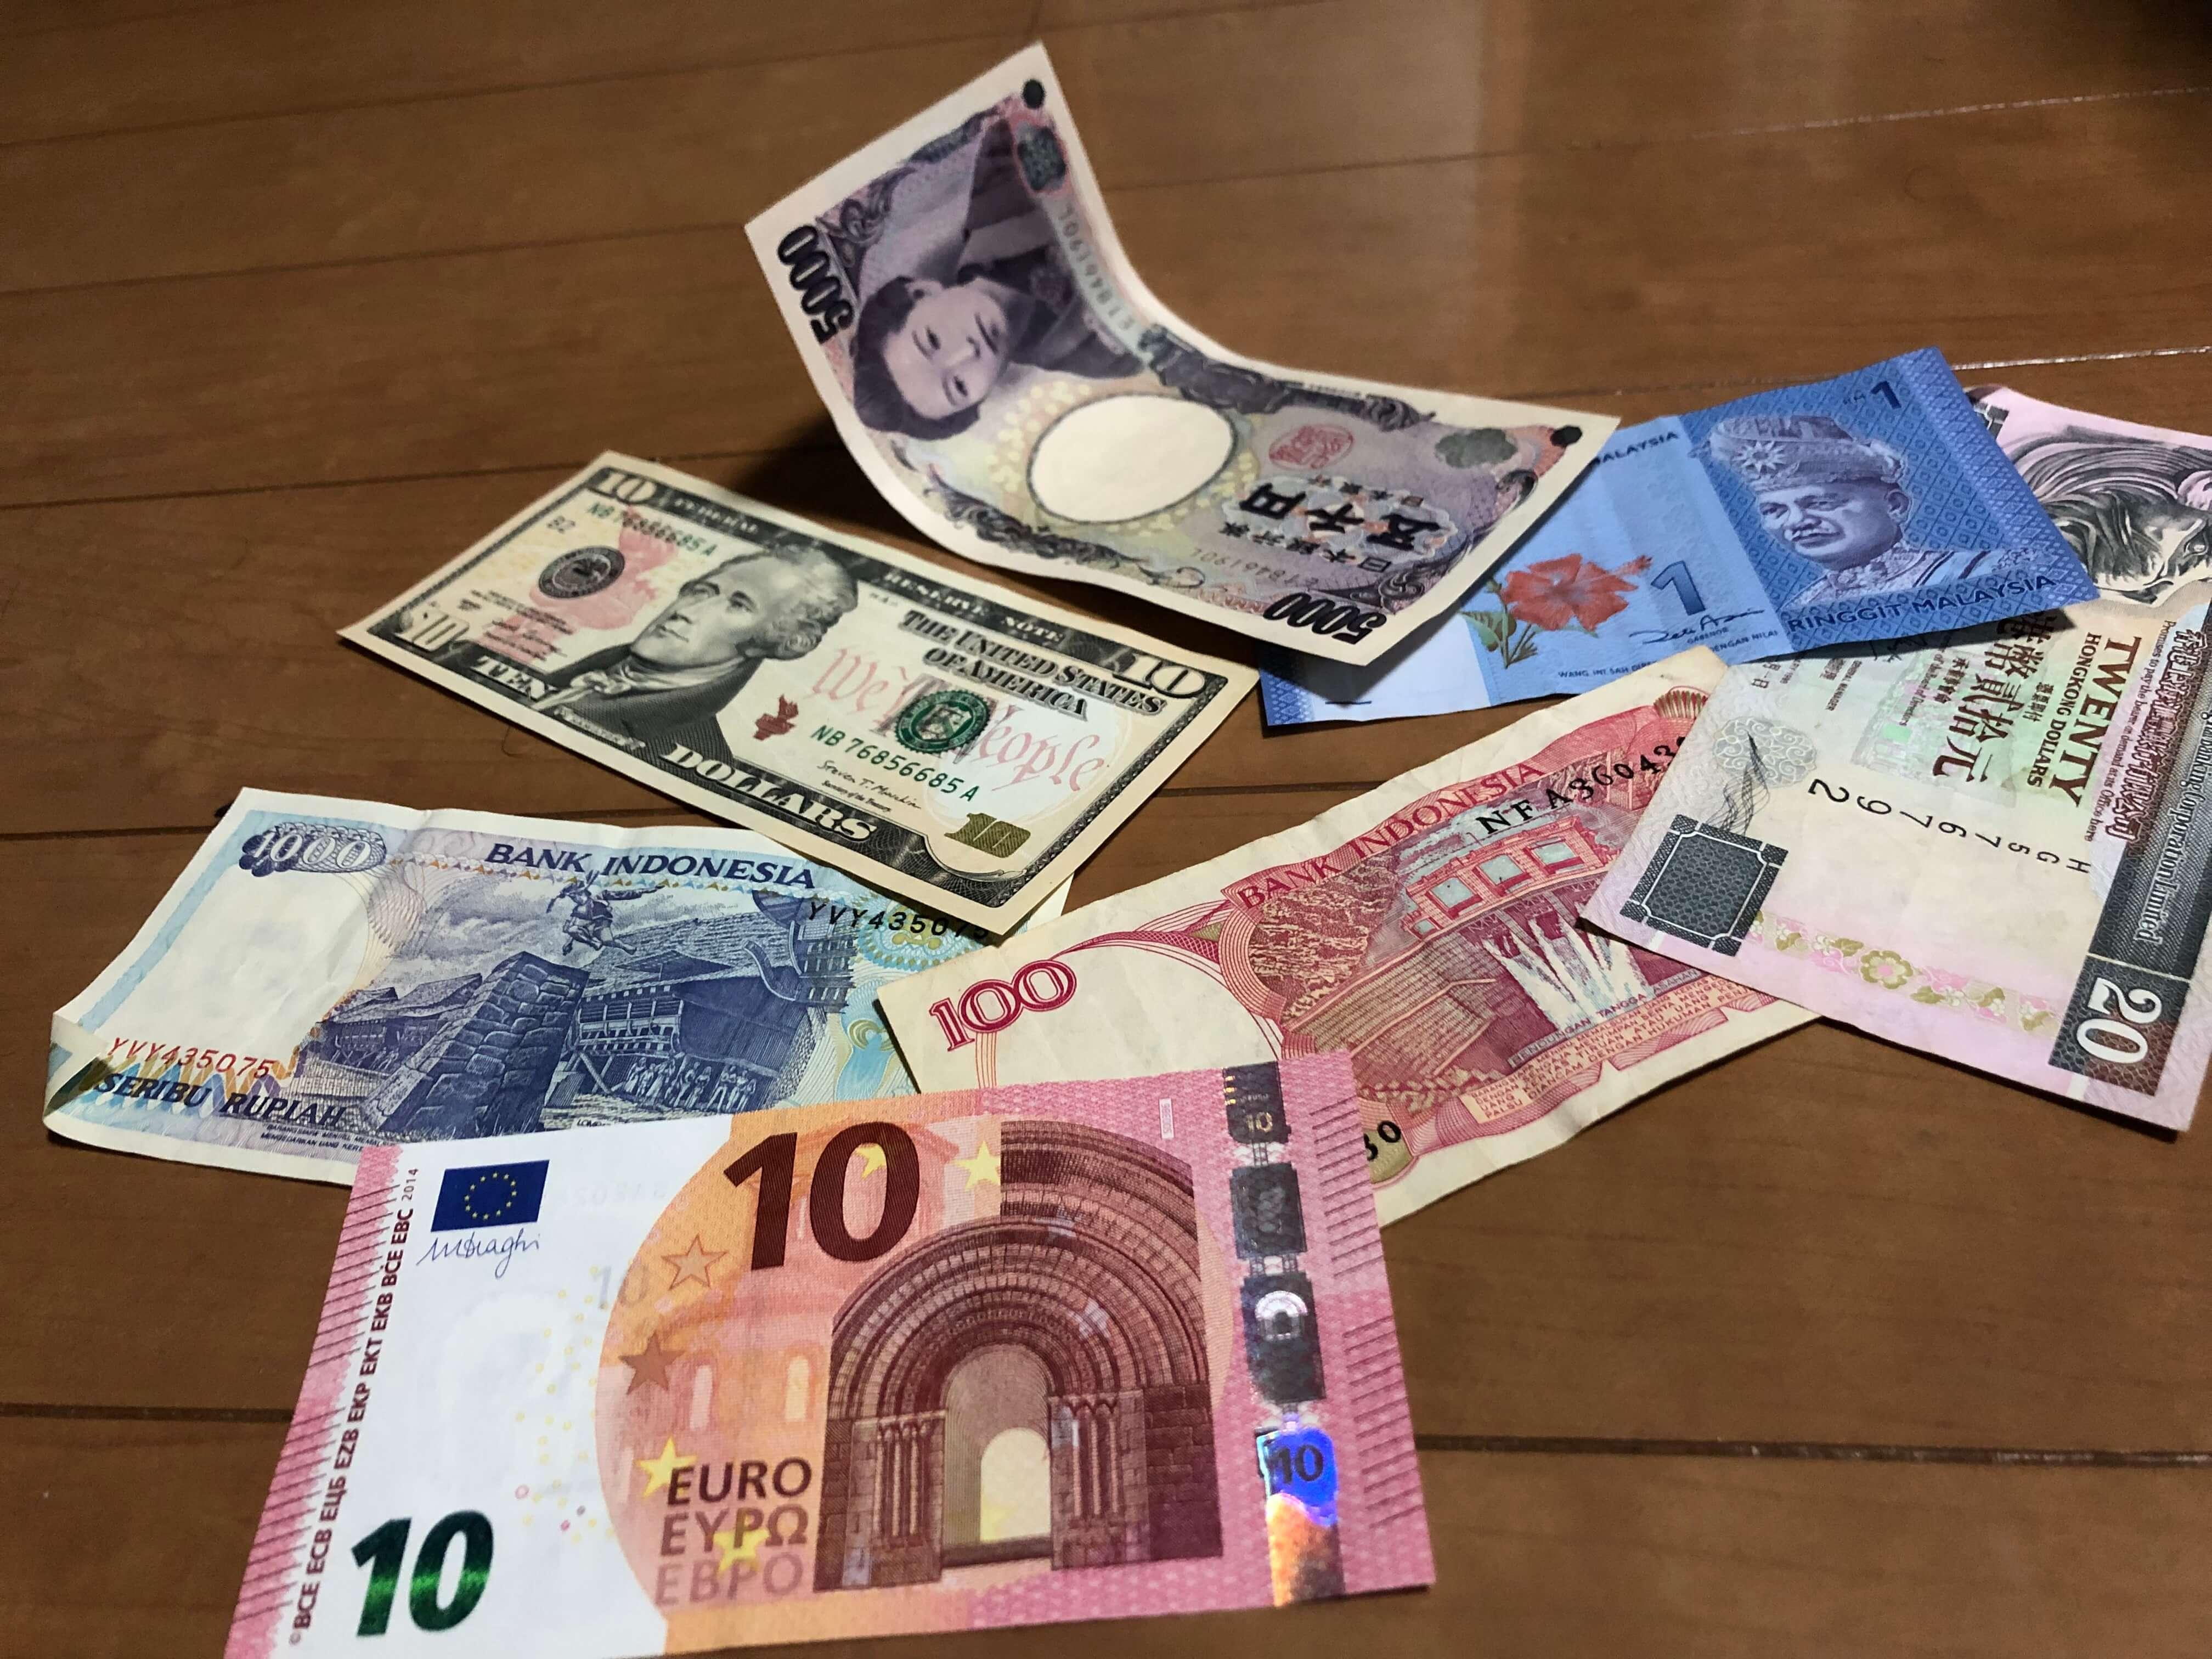 IMG 4485 - 結局、マイナー通貨はどうやってすれば得なの?メジャー通貨は?